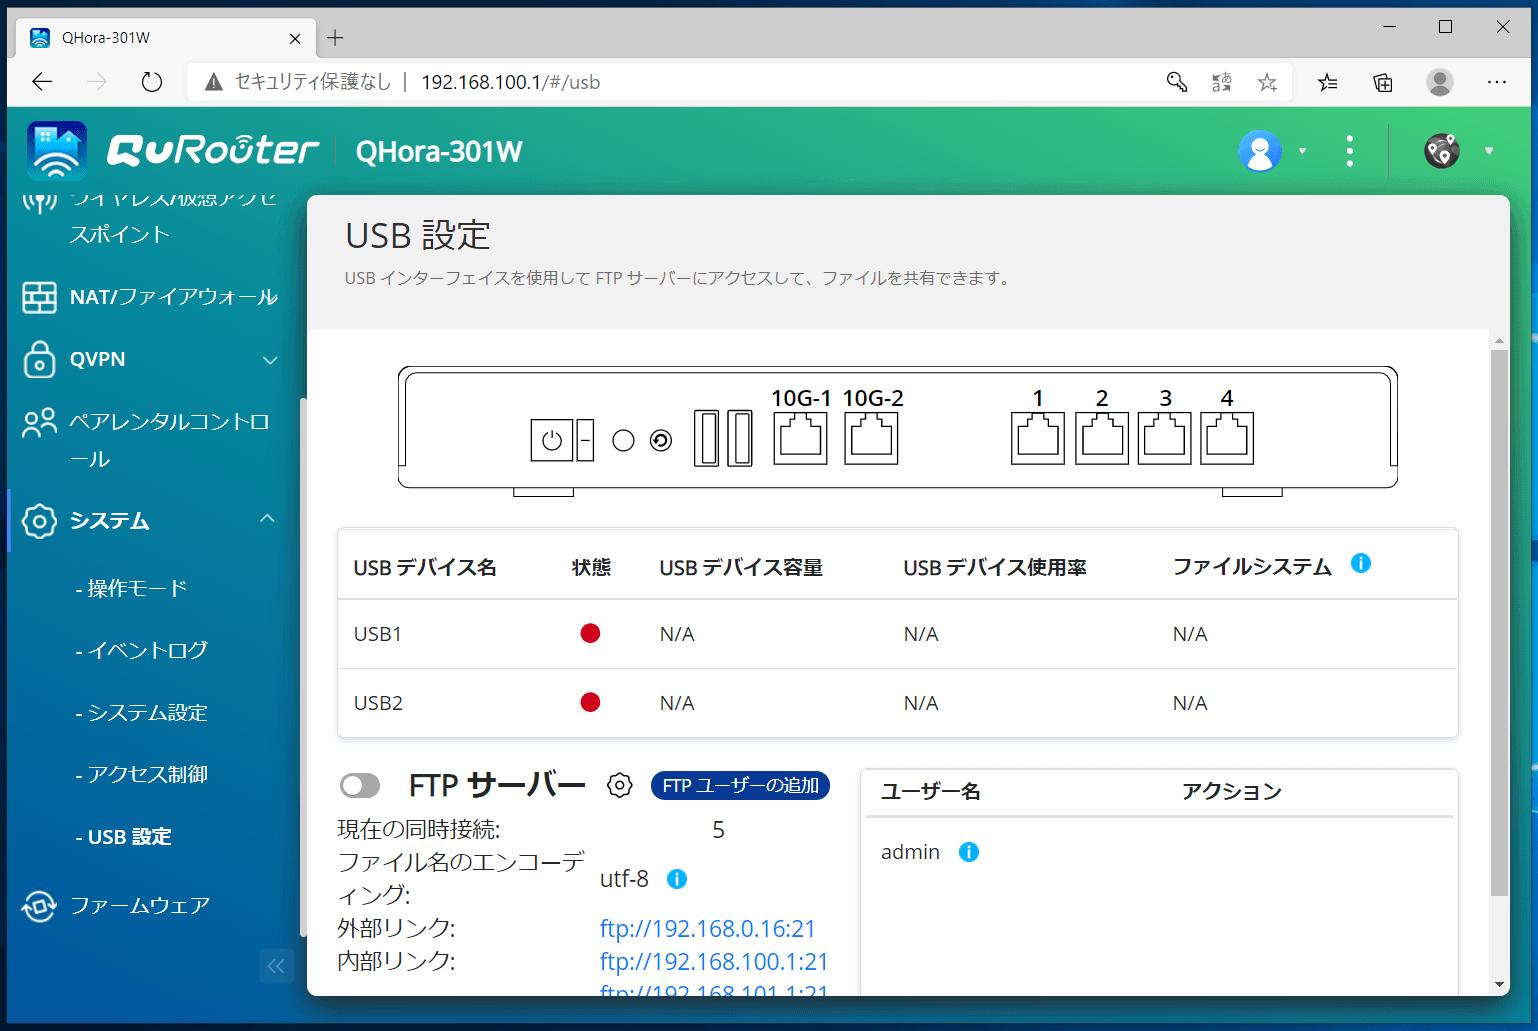 QNAP QHora-301W_setting_7_USB